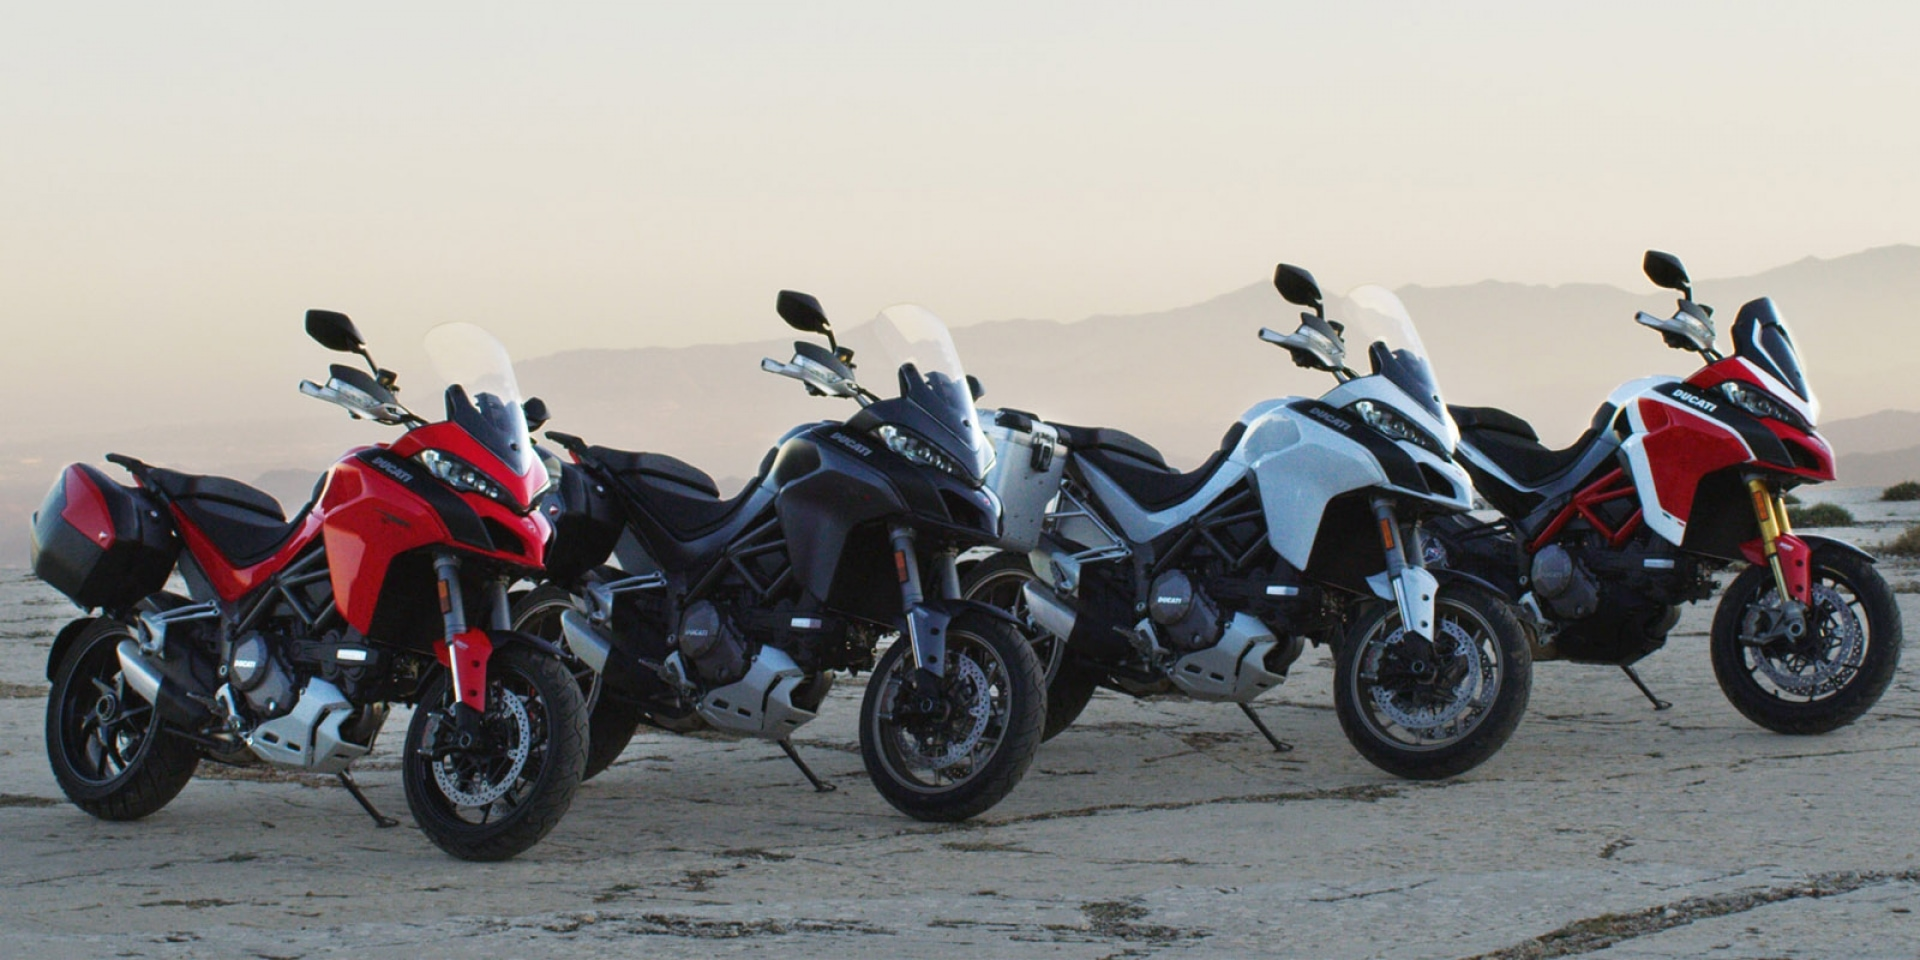 V4多功能車來了! Ducati親自證實Multistrada V4 2021年上市